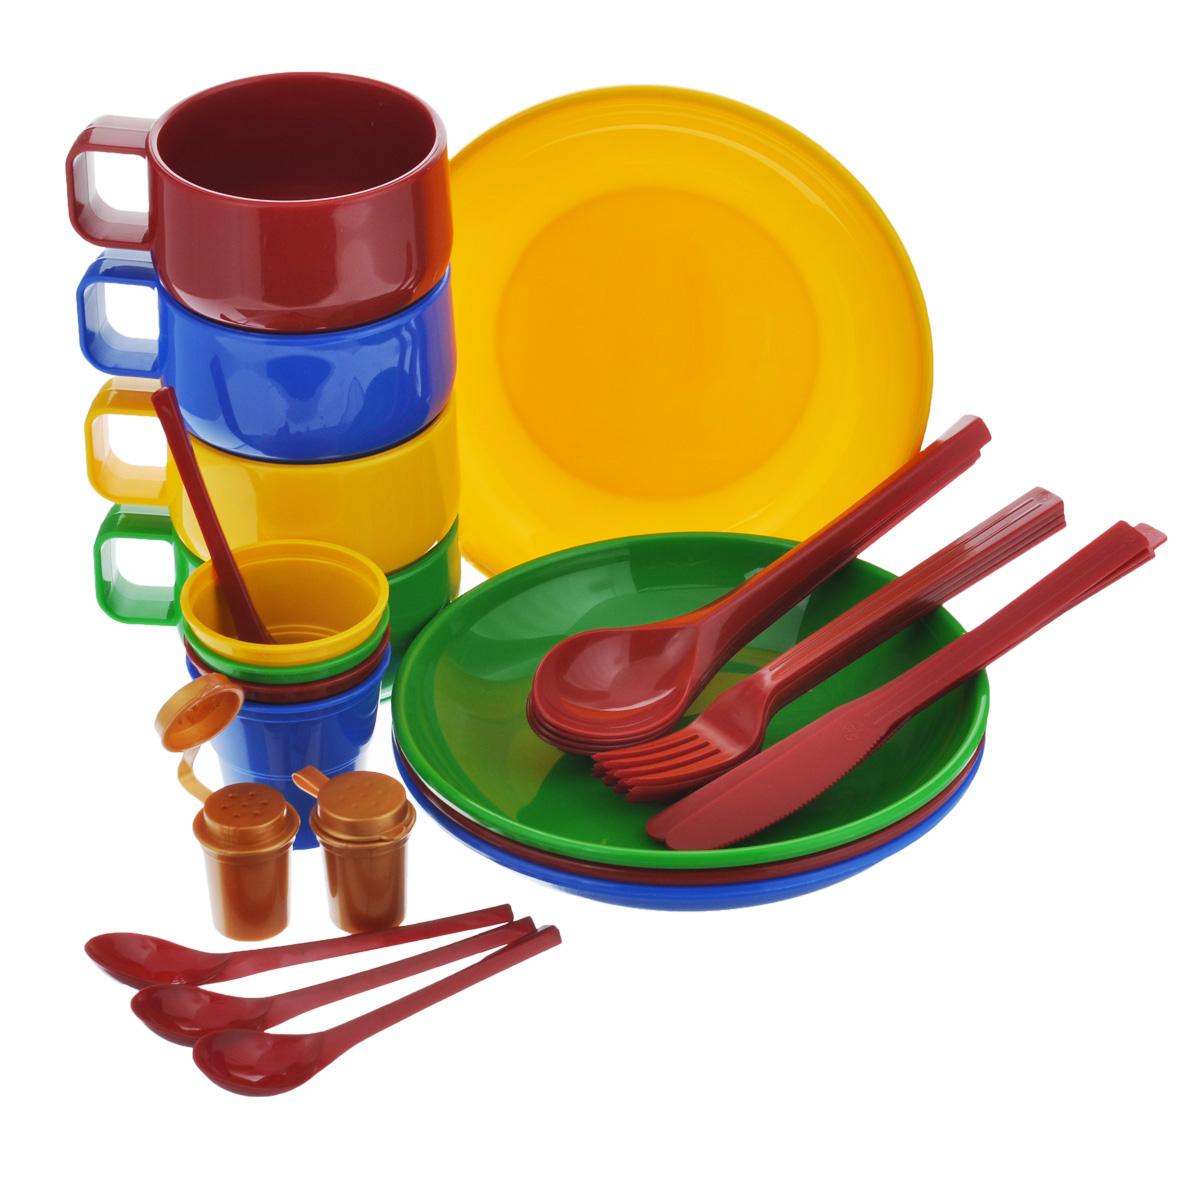 Набор посуды Solaris, на 4 персоны